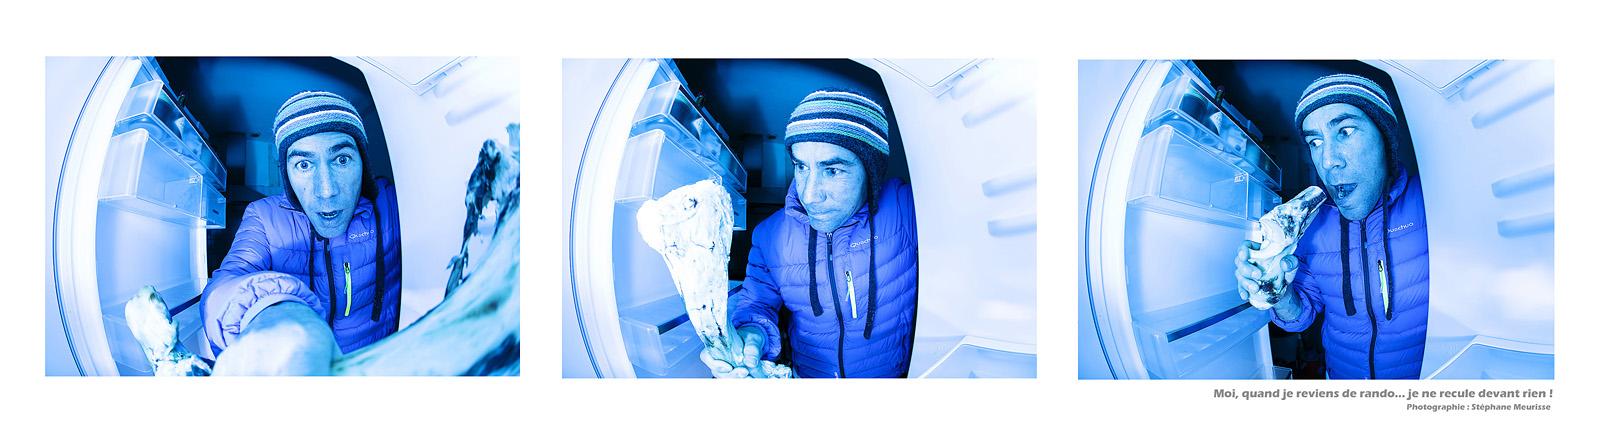 strobist-frigo_1600px